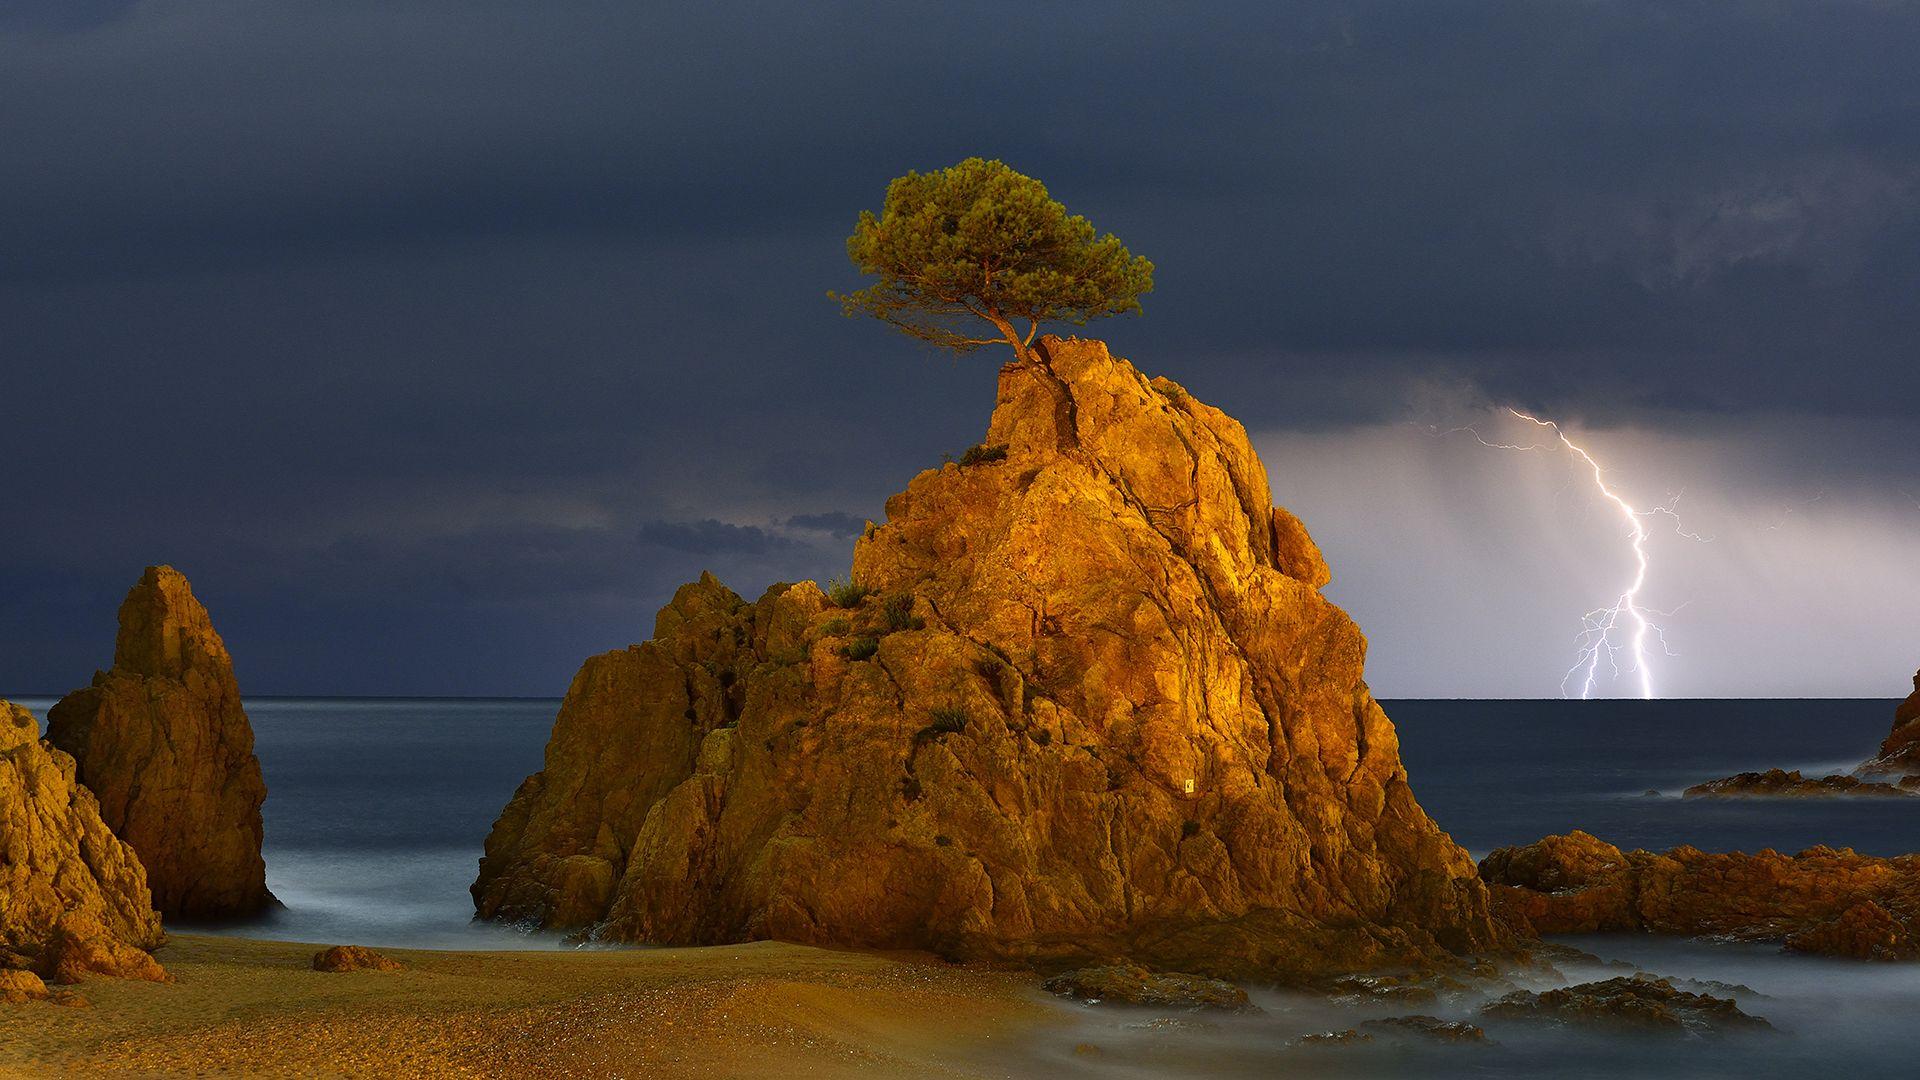 Pine rock lightning and full moon